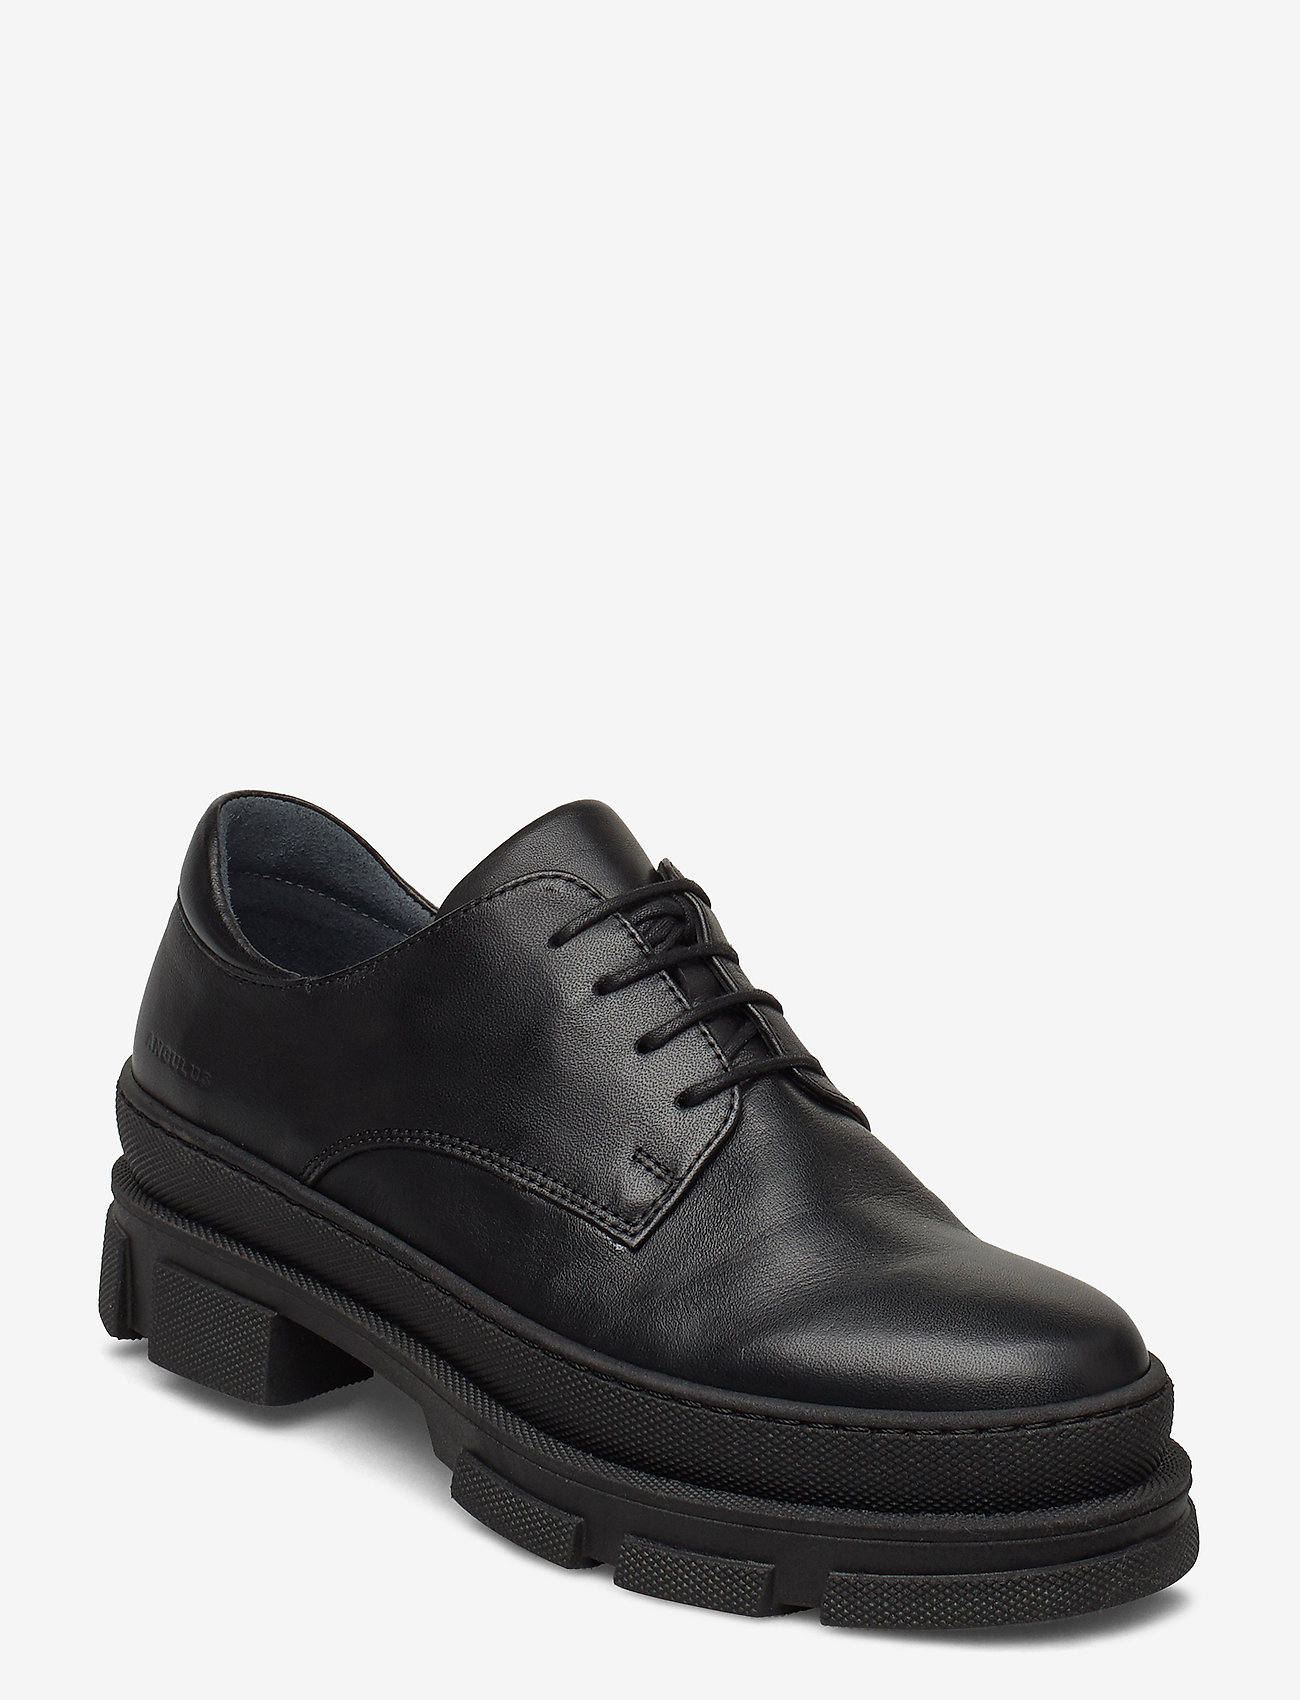 ANGULUS - Shoes - flat - with lace - buty sznurowane - 1604 black - 0